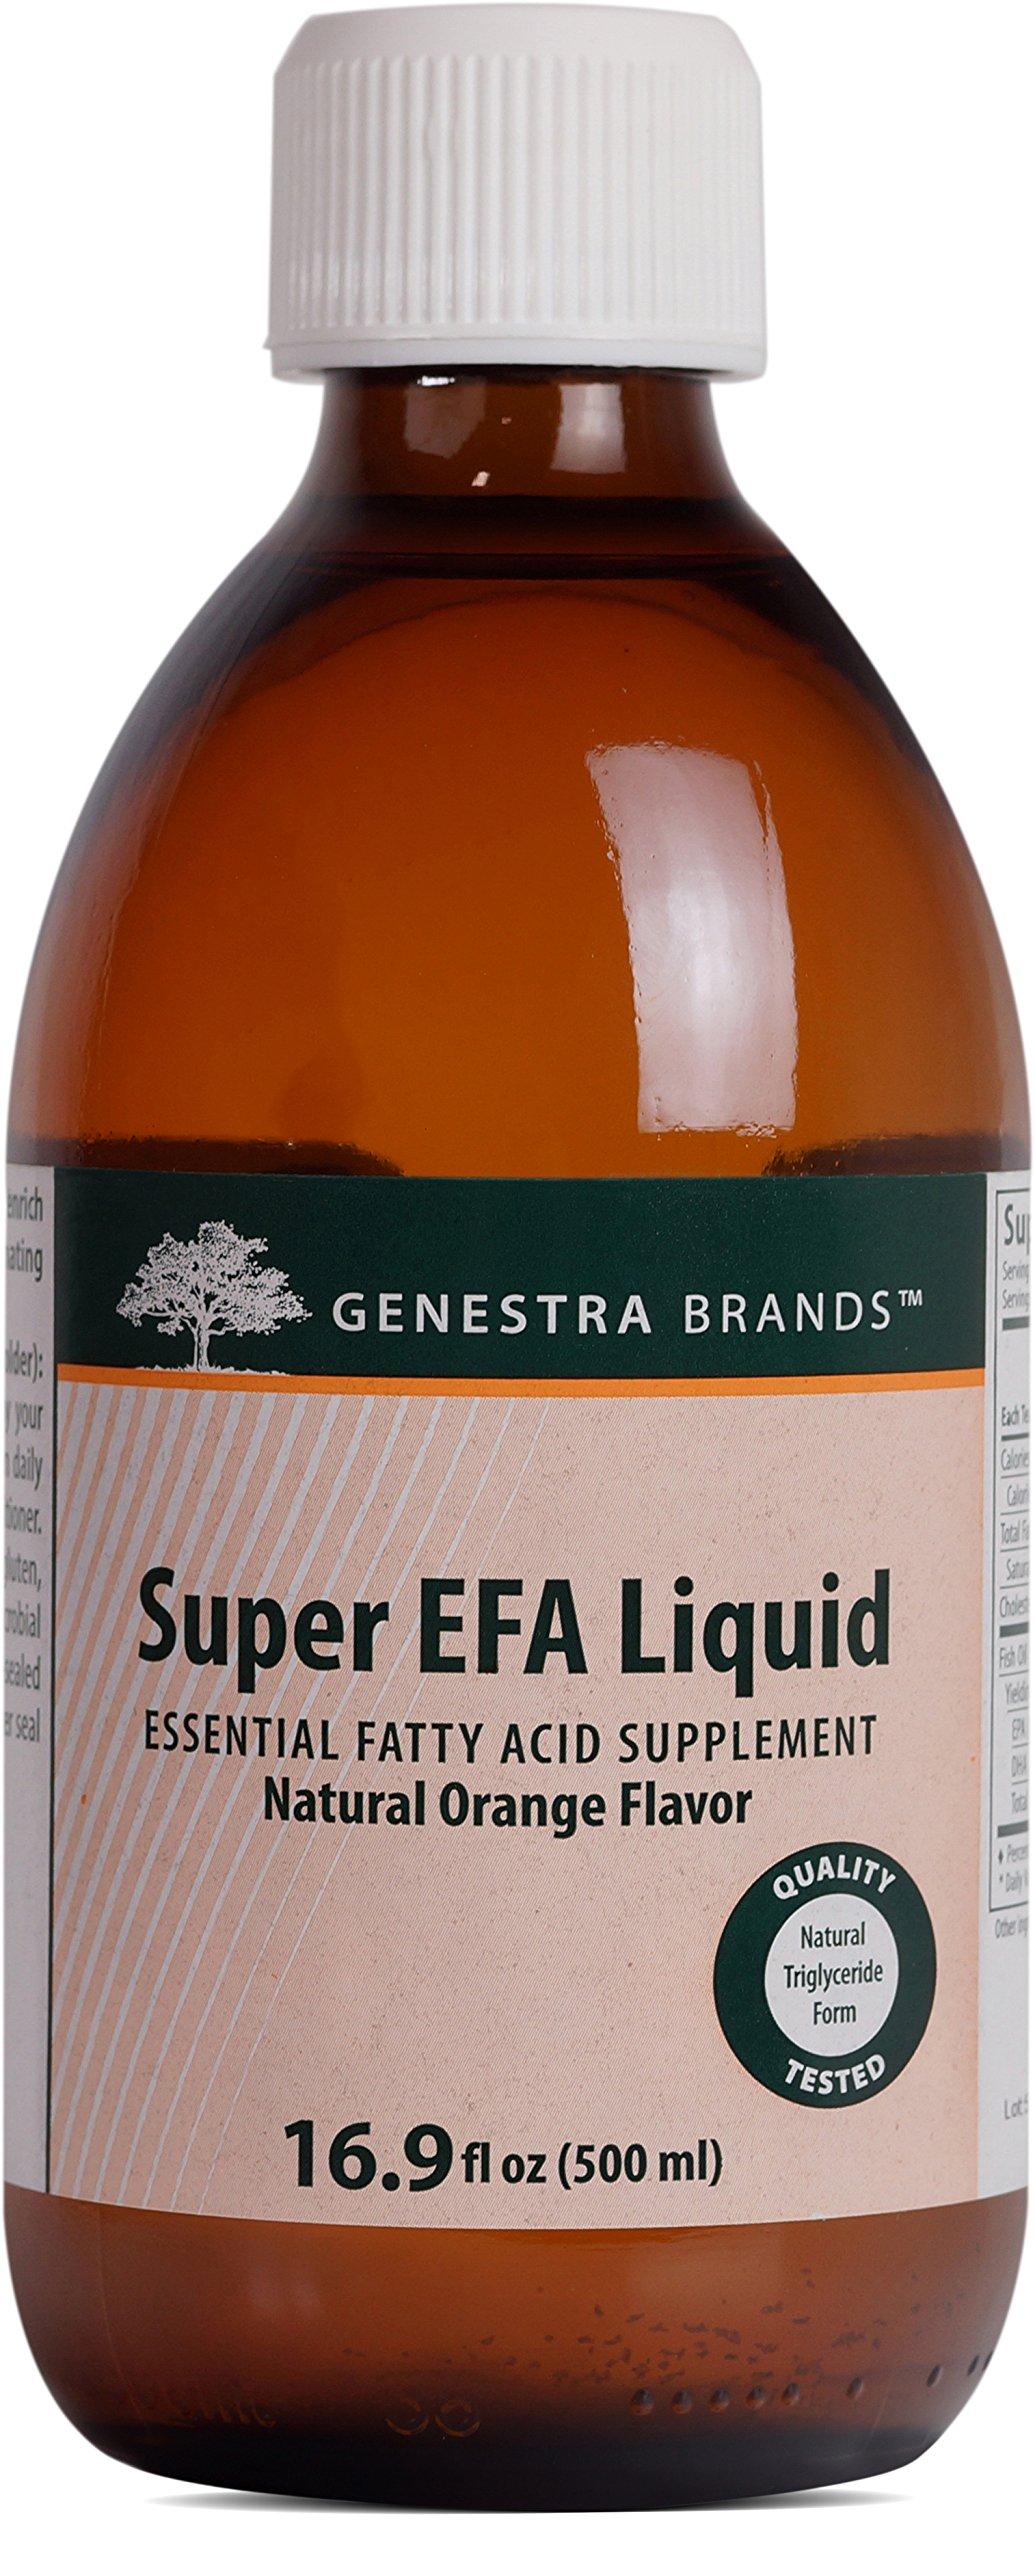 Genestra Brands - Super EFA Liquid - Supports Cardiovascular, Brain, Eyes, and Nerves* - Natural Orange Flavor - 16.9 fl oz (500 ml)